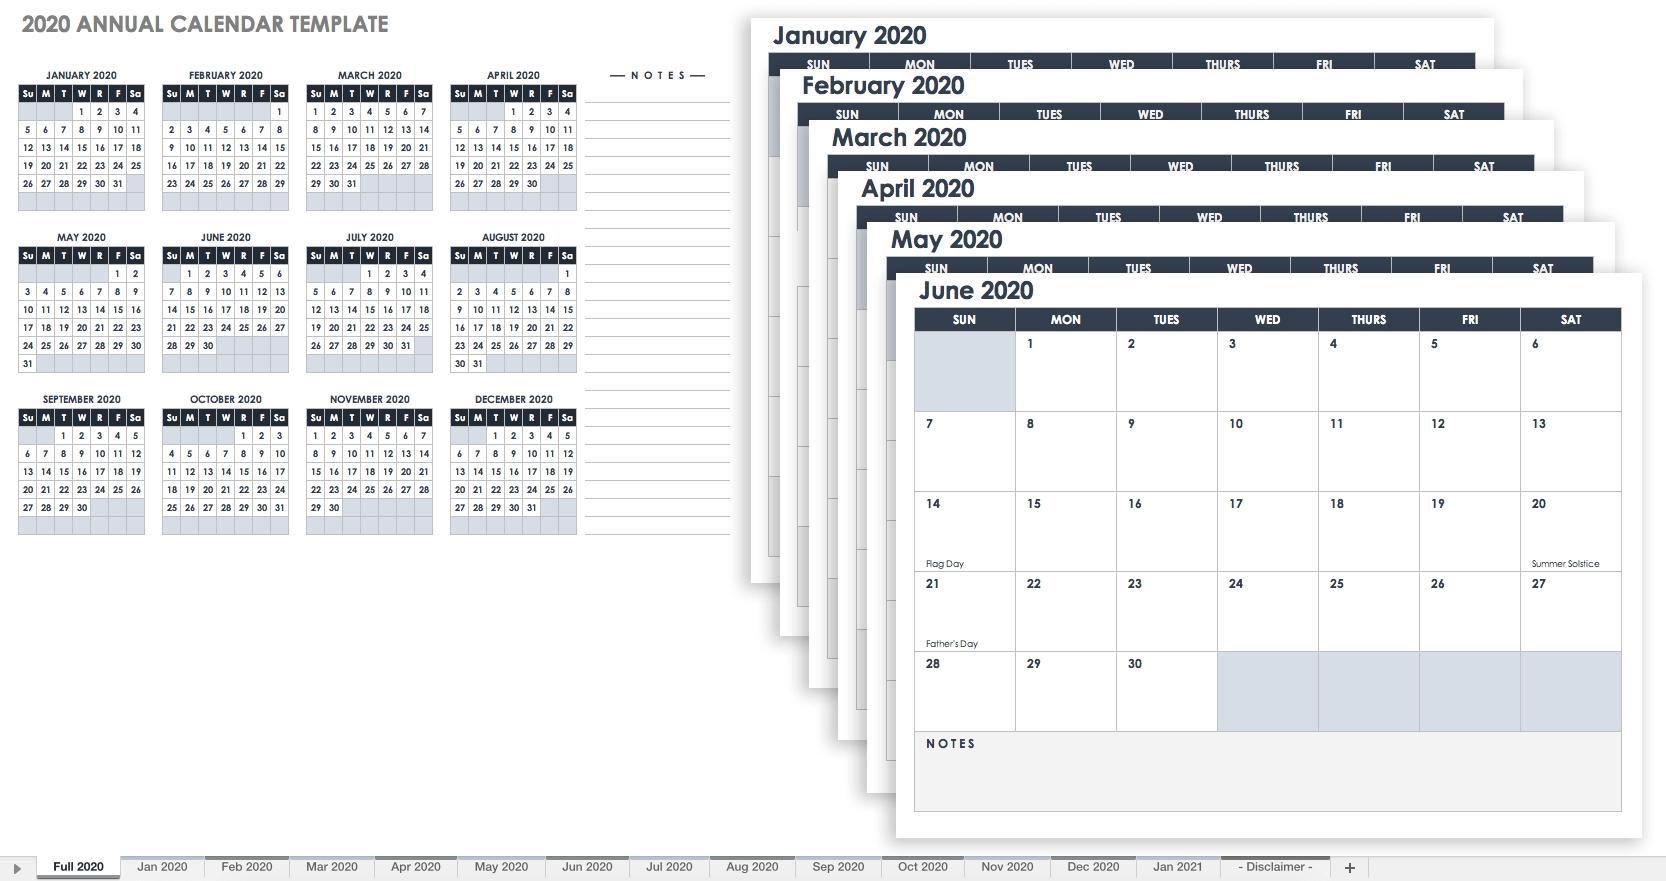 Free Blank Calendar Templates - Smartsheet_Blank Yearly Calendar Template Pdf